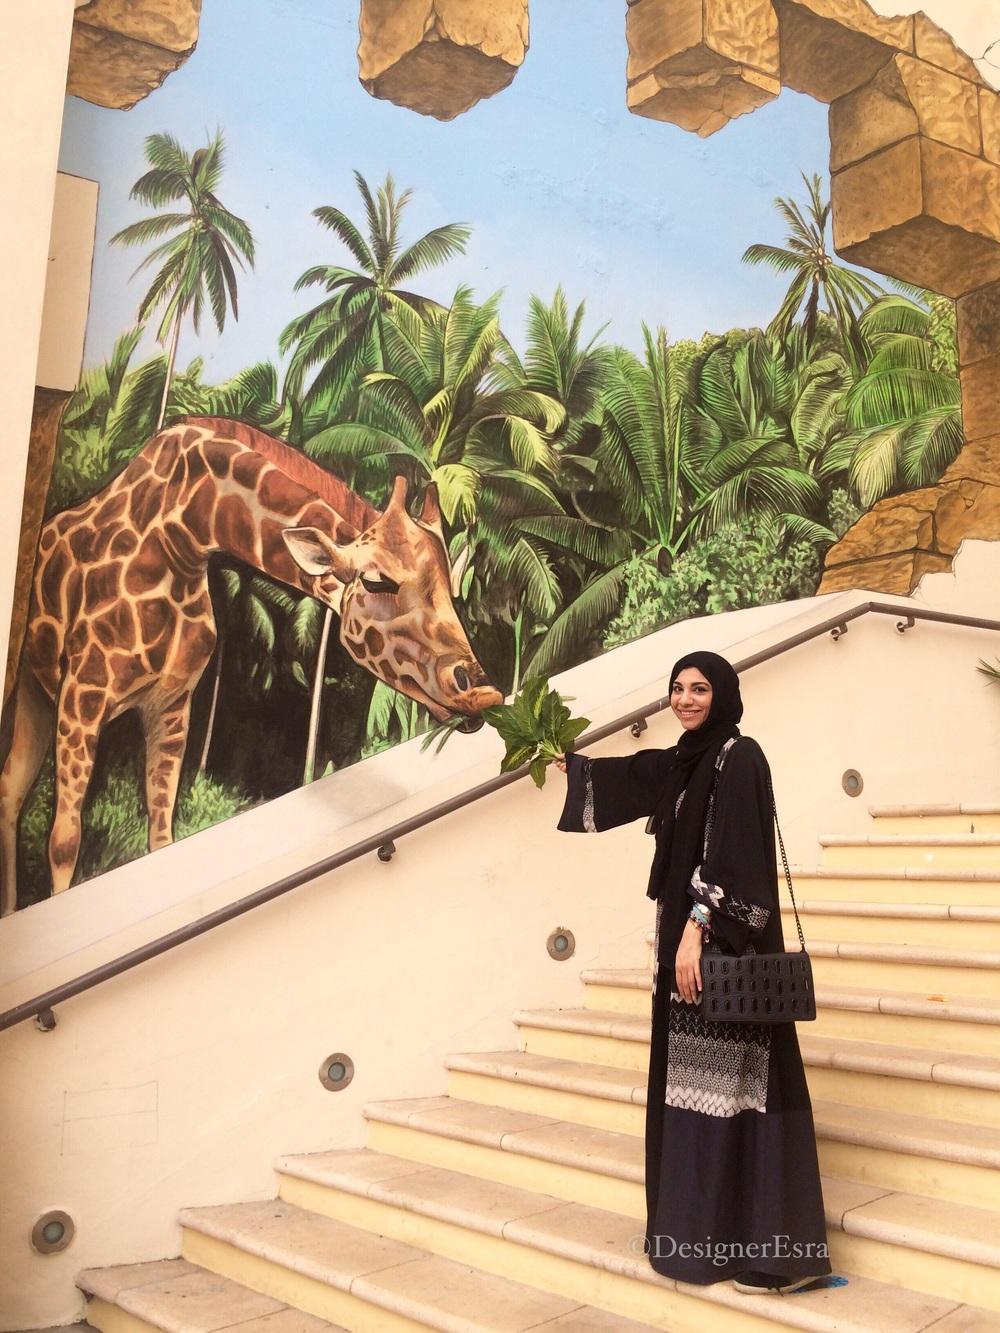 3D Giraffe Street Painting in Dubai